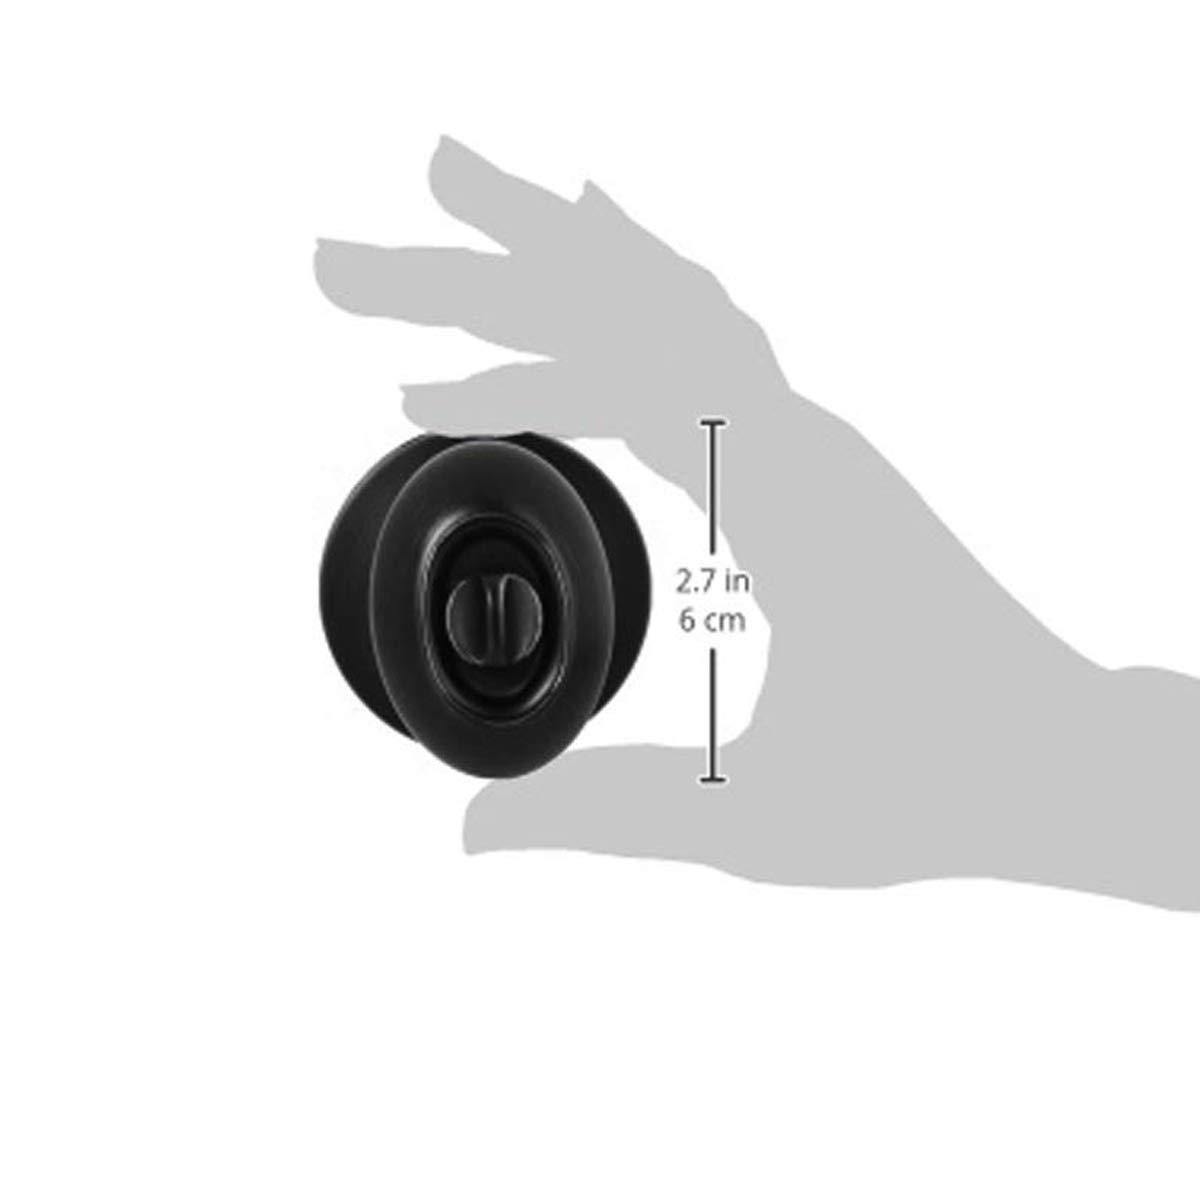 Standard Ball Basics Privacy Door Knob With Lock Matte Black